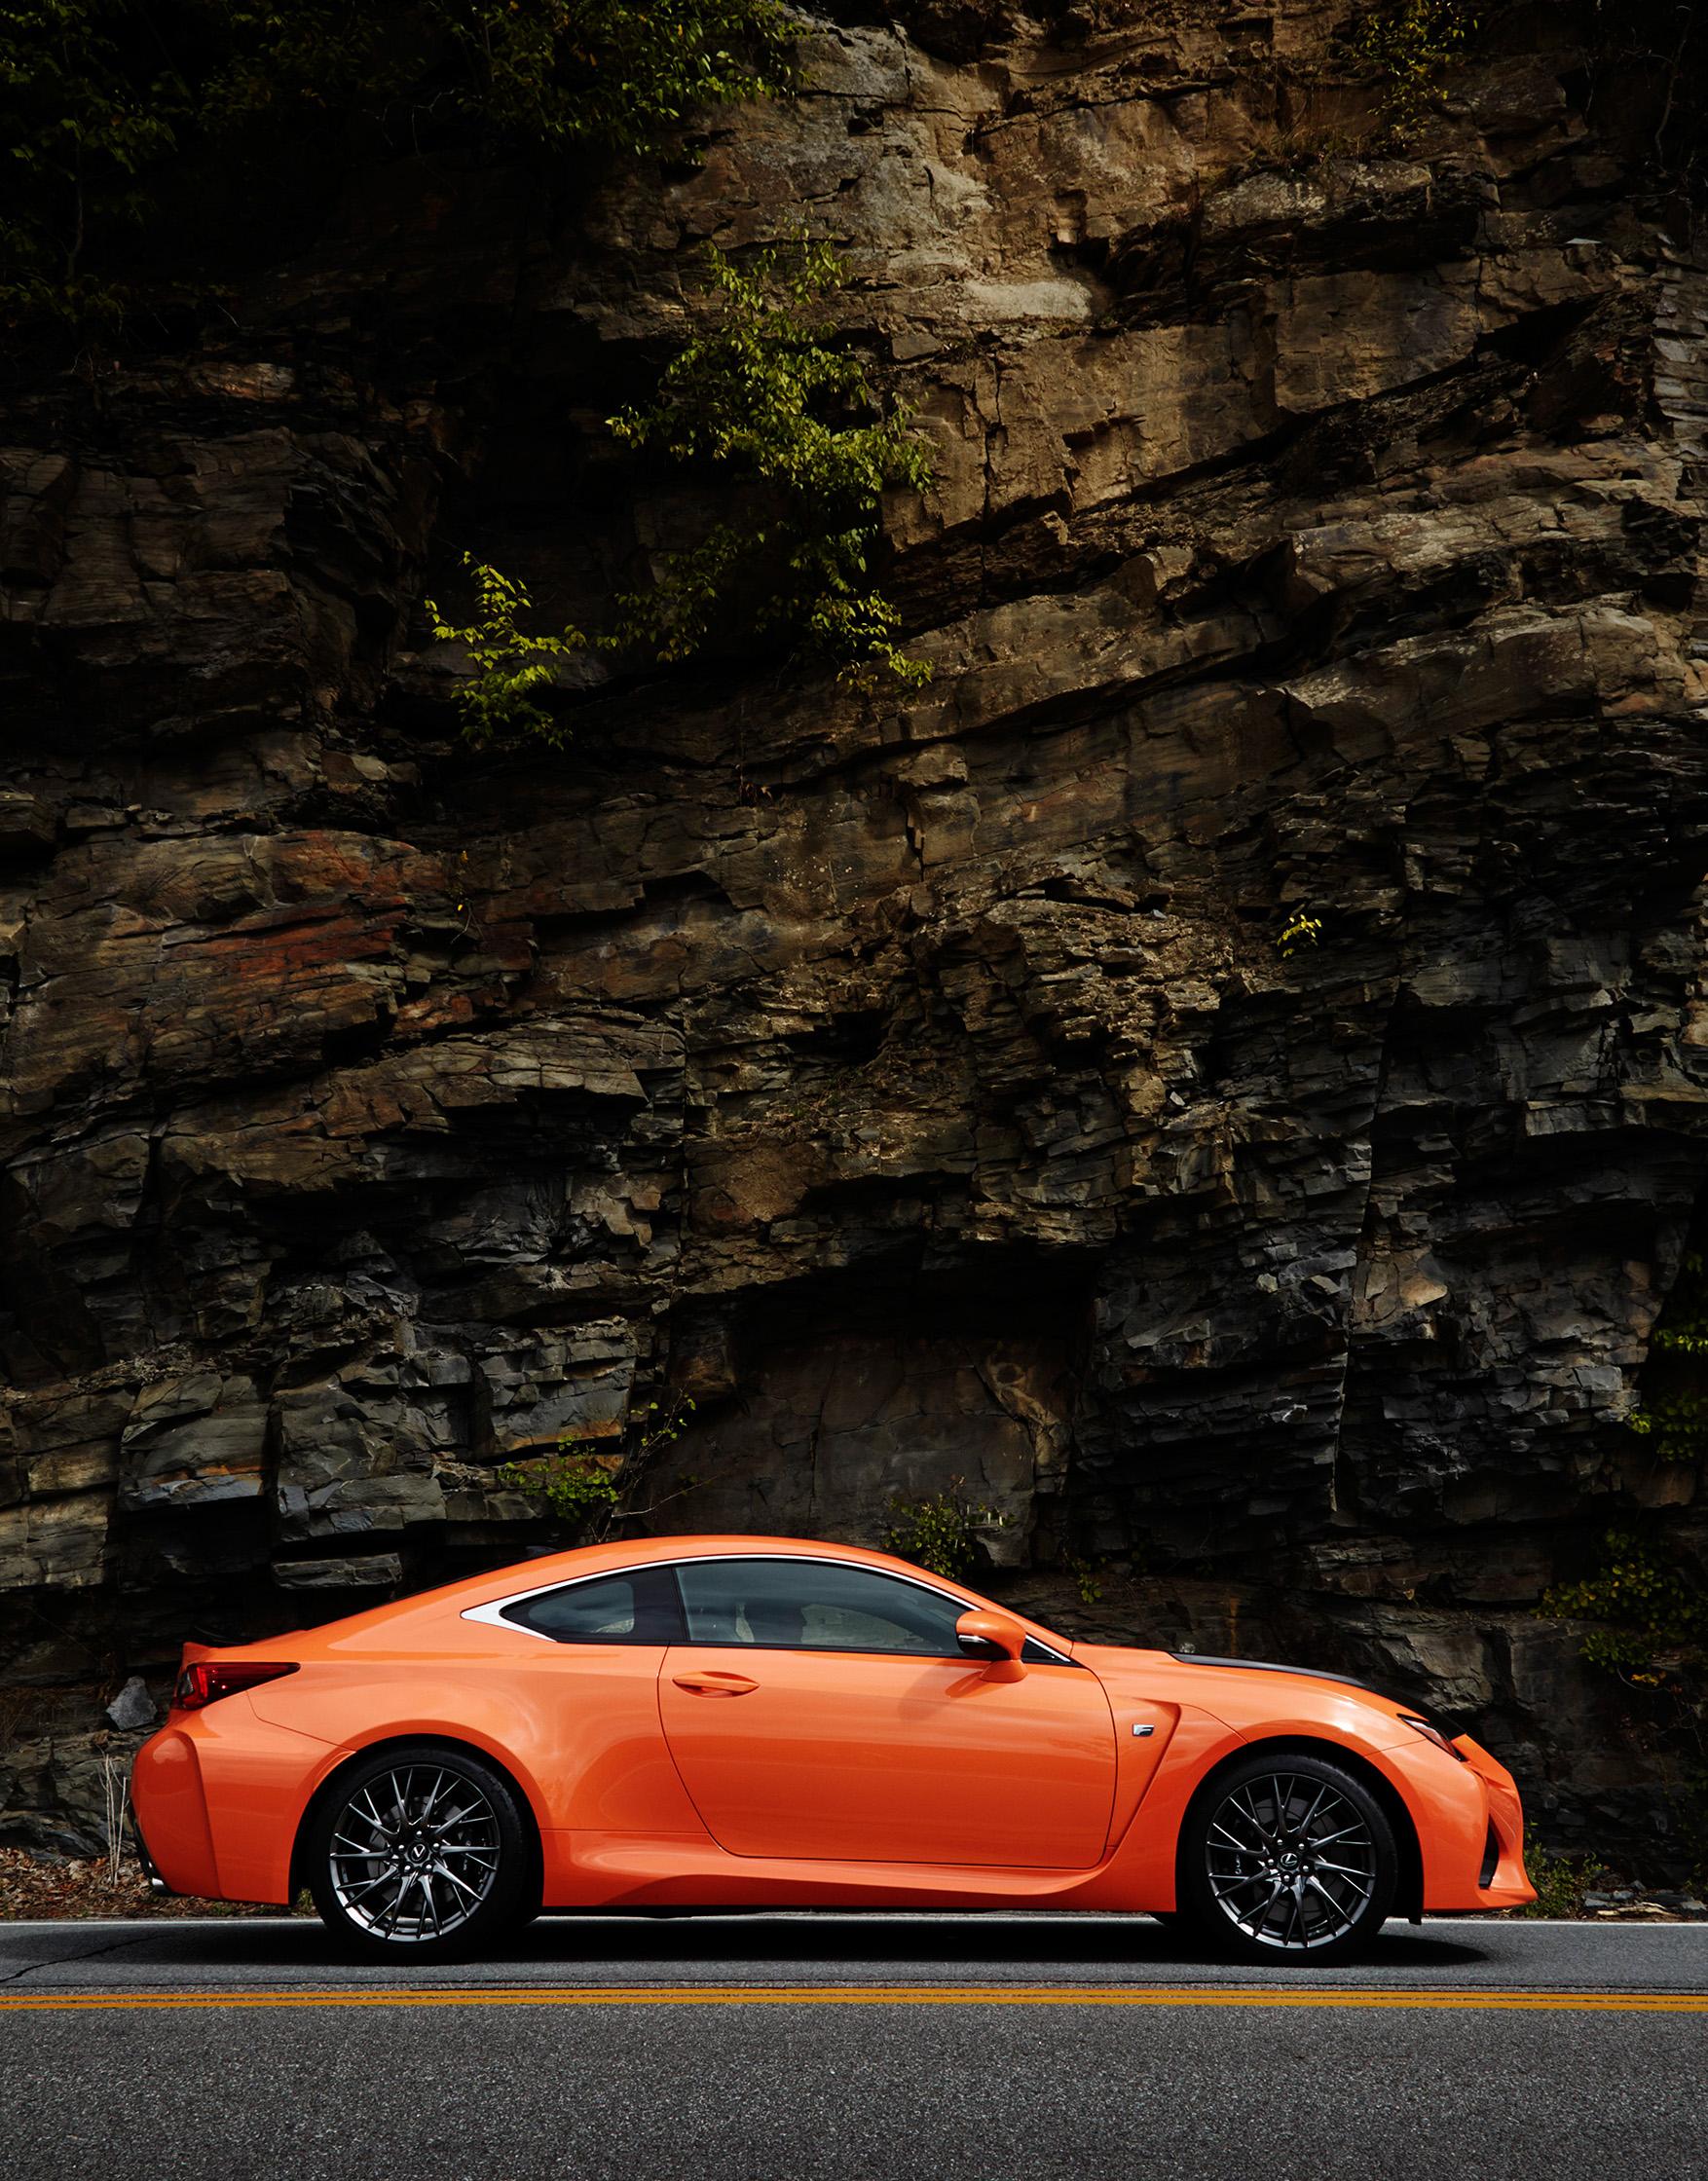 07_Lexus_Landscape_013.jpg